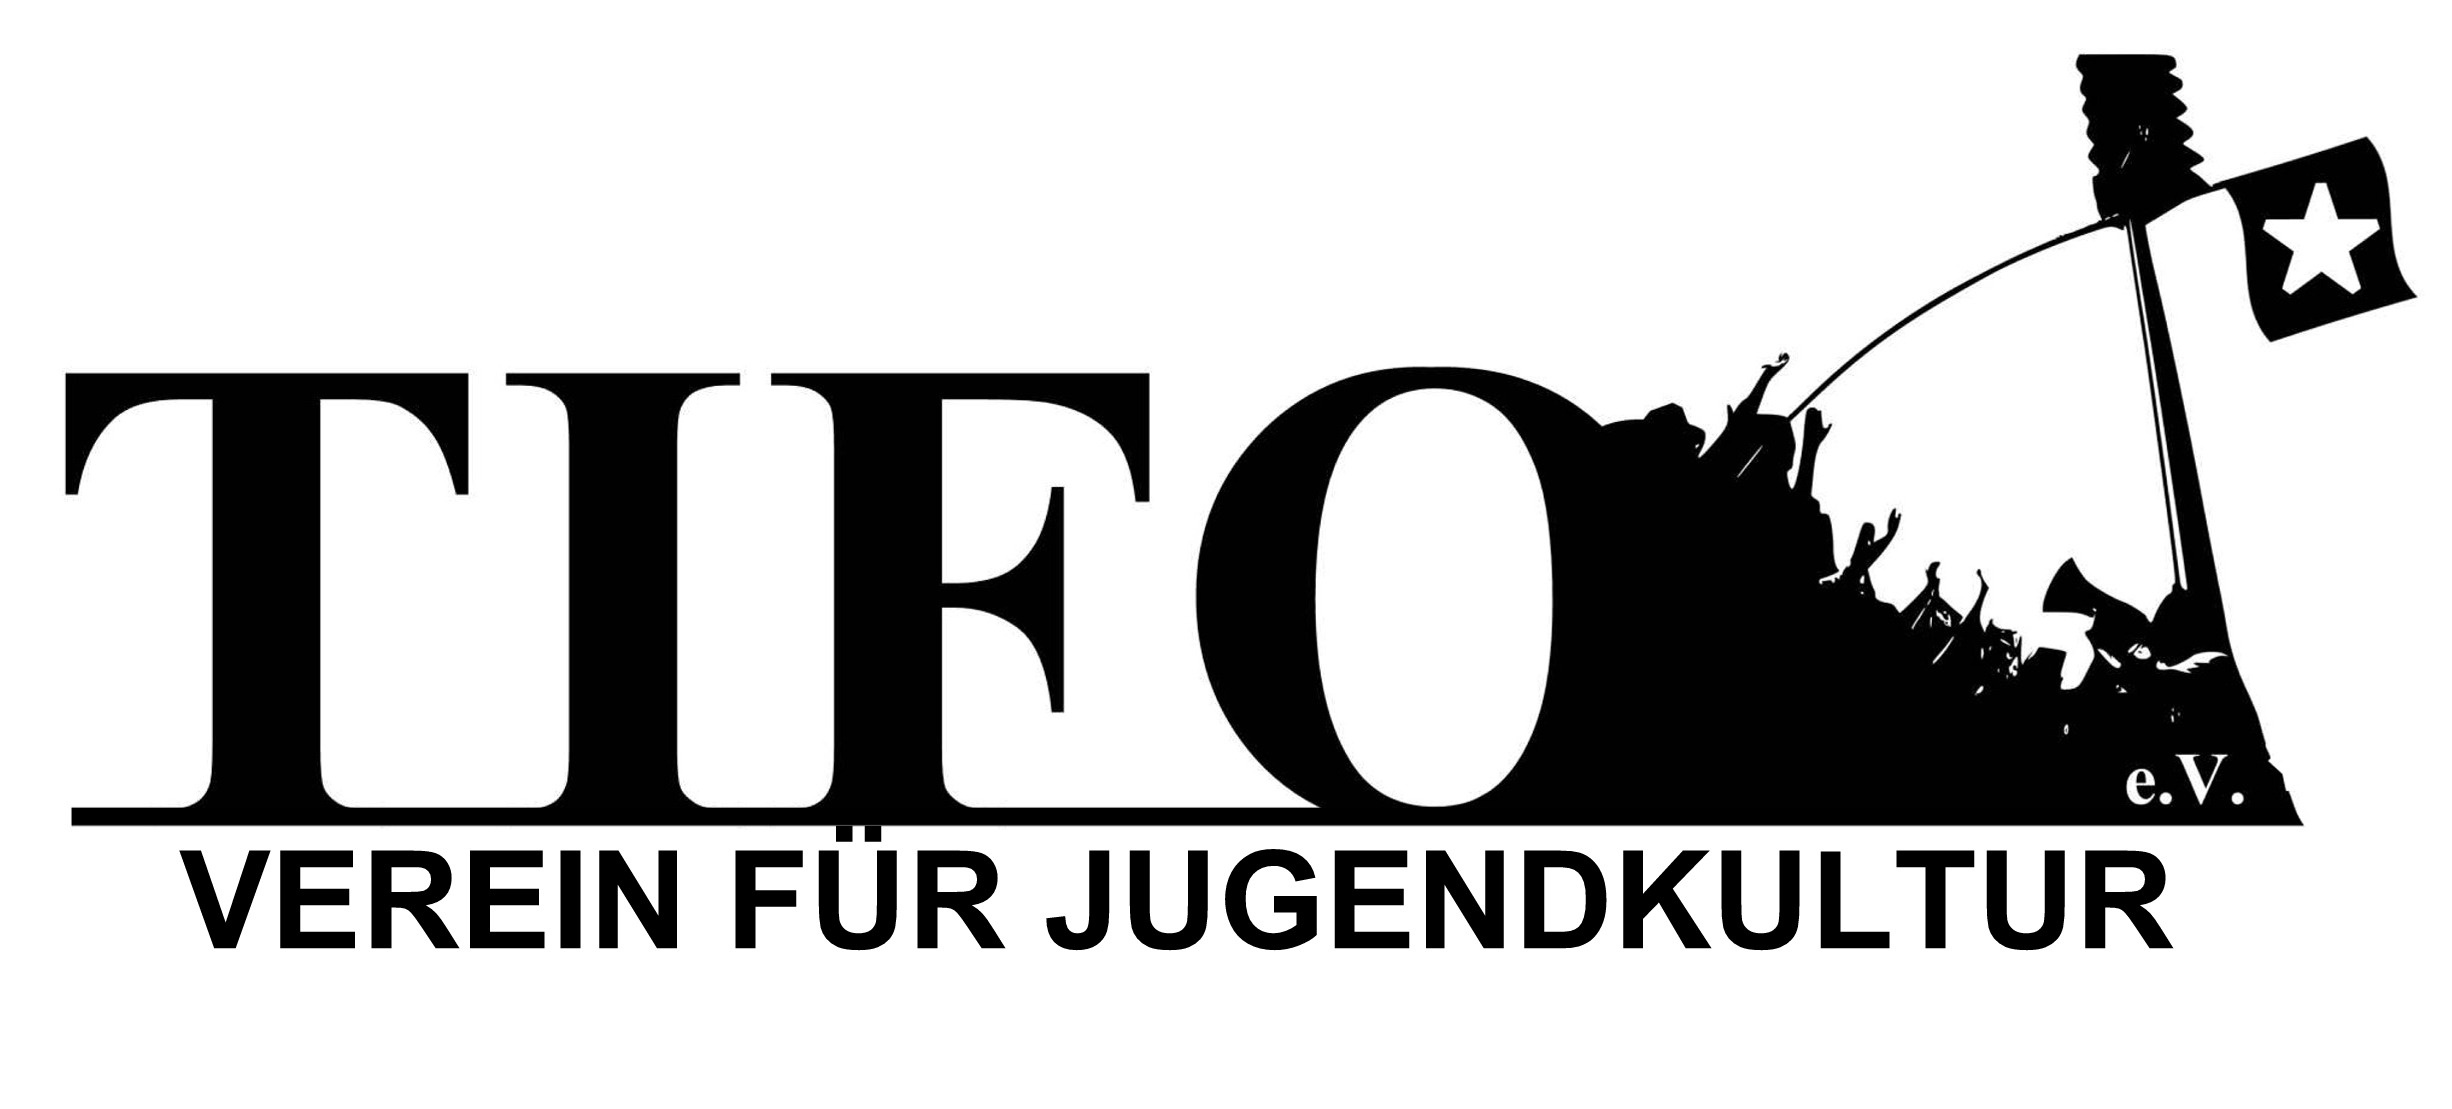 gefördert vom TIFO e.V. - Verein für Jugendkultur